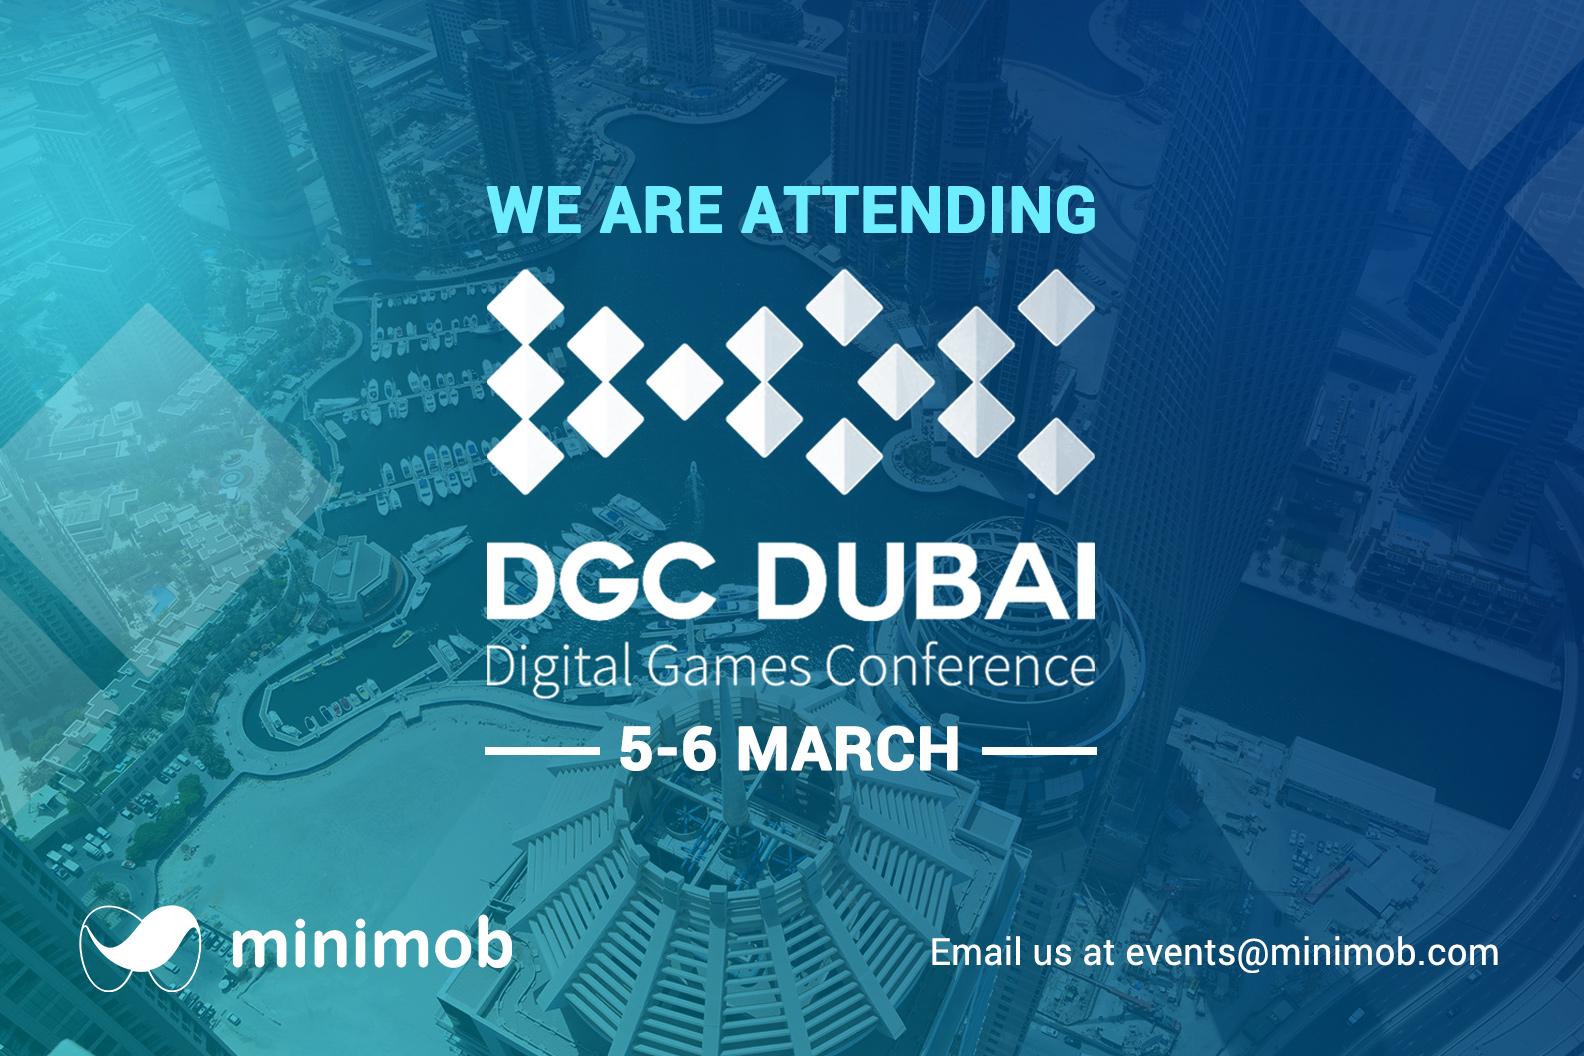 DGC-Dubai_2019_linkedin_792x528_2x